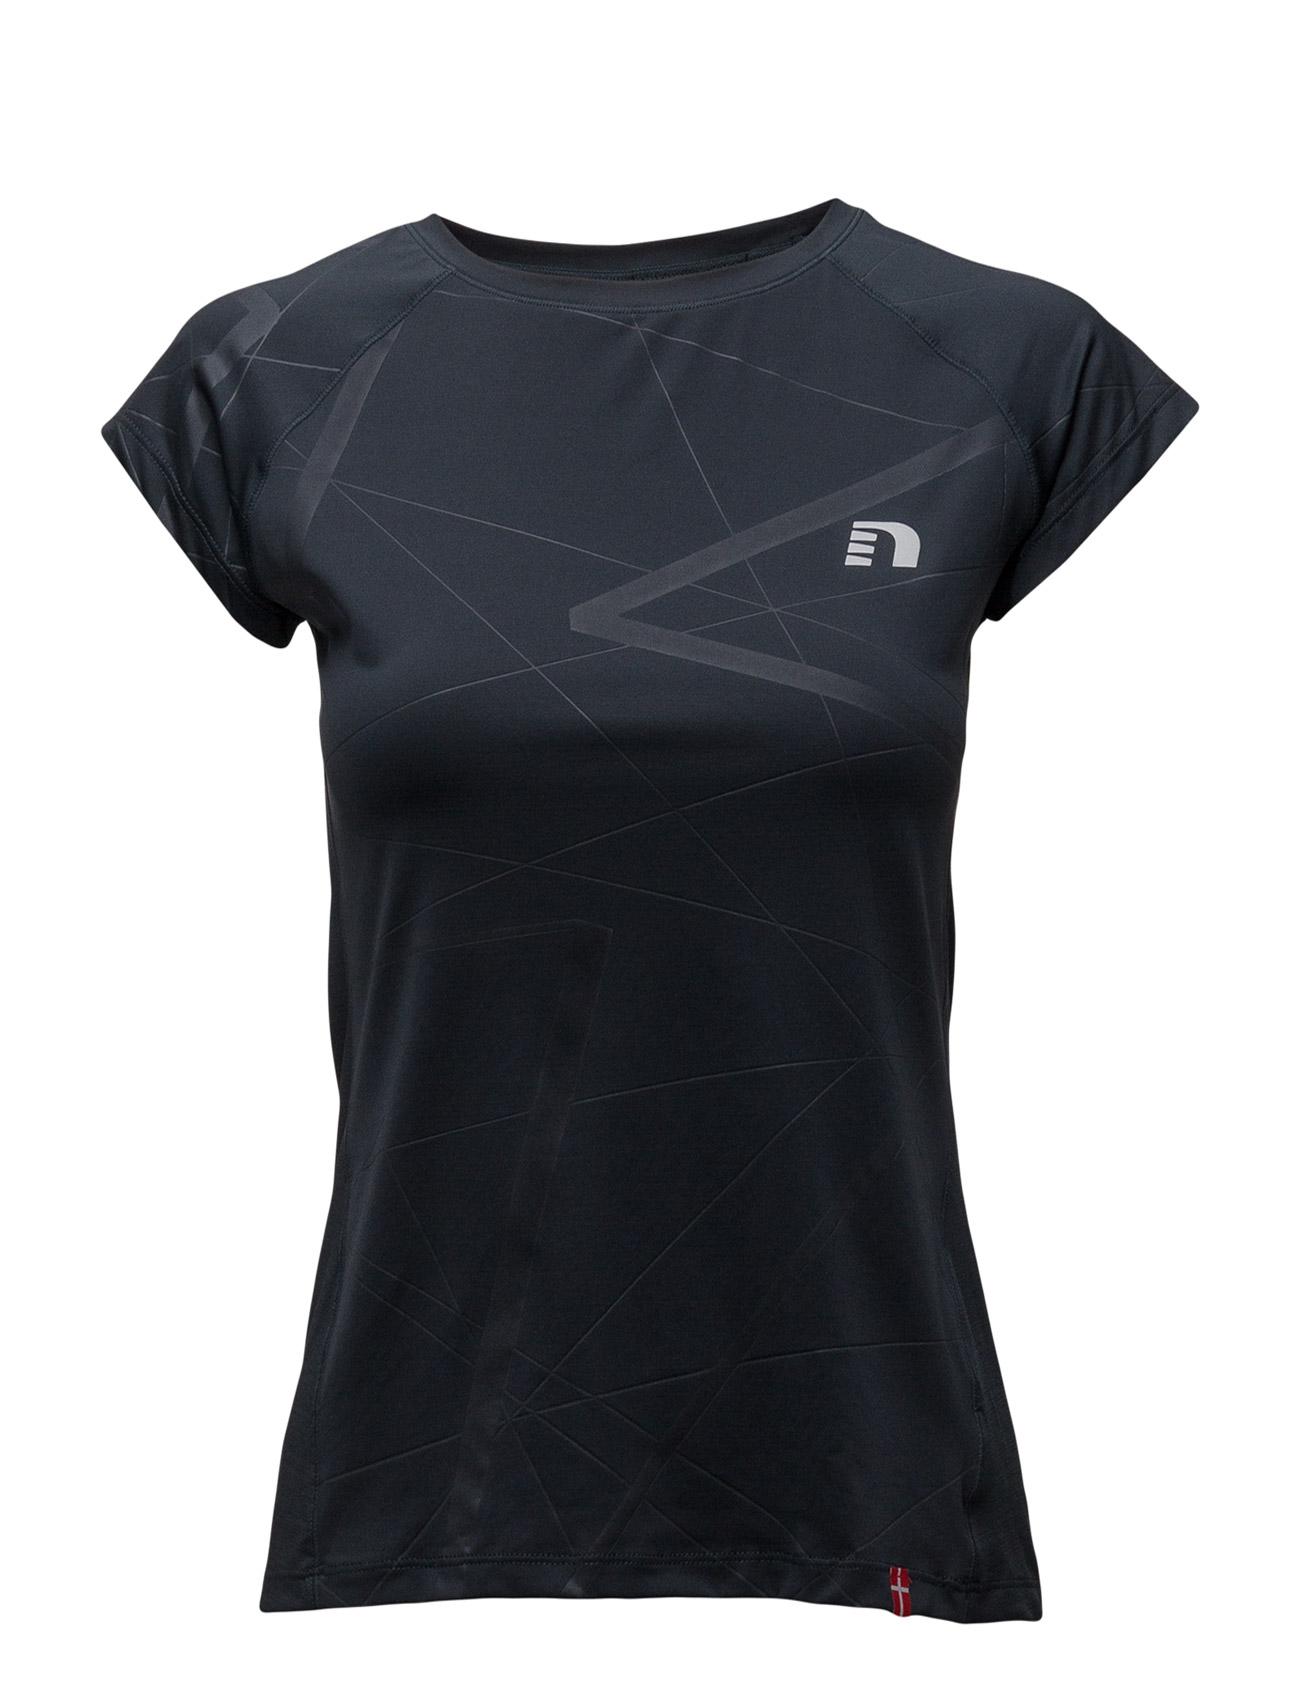 Imotion Capsleeve Tee Newline Running T-Shirts